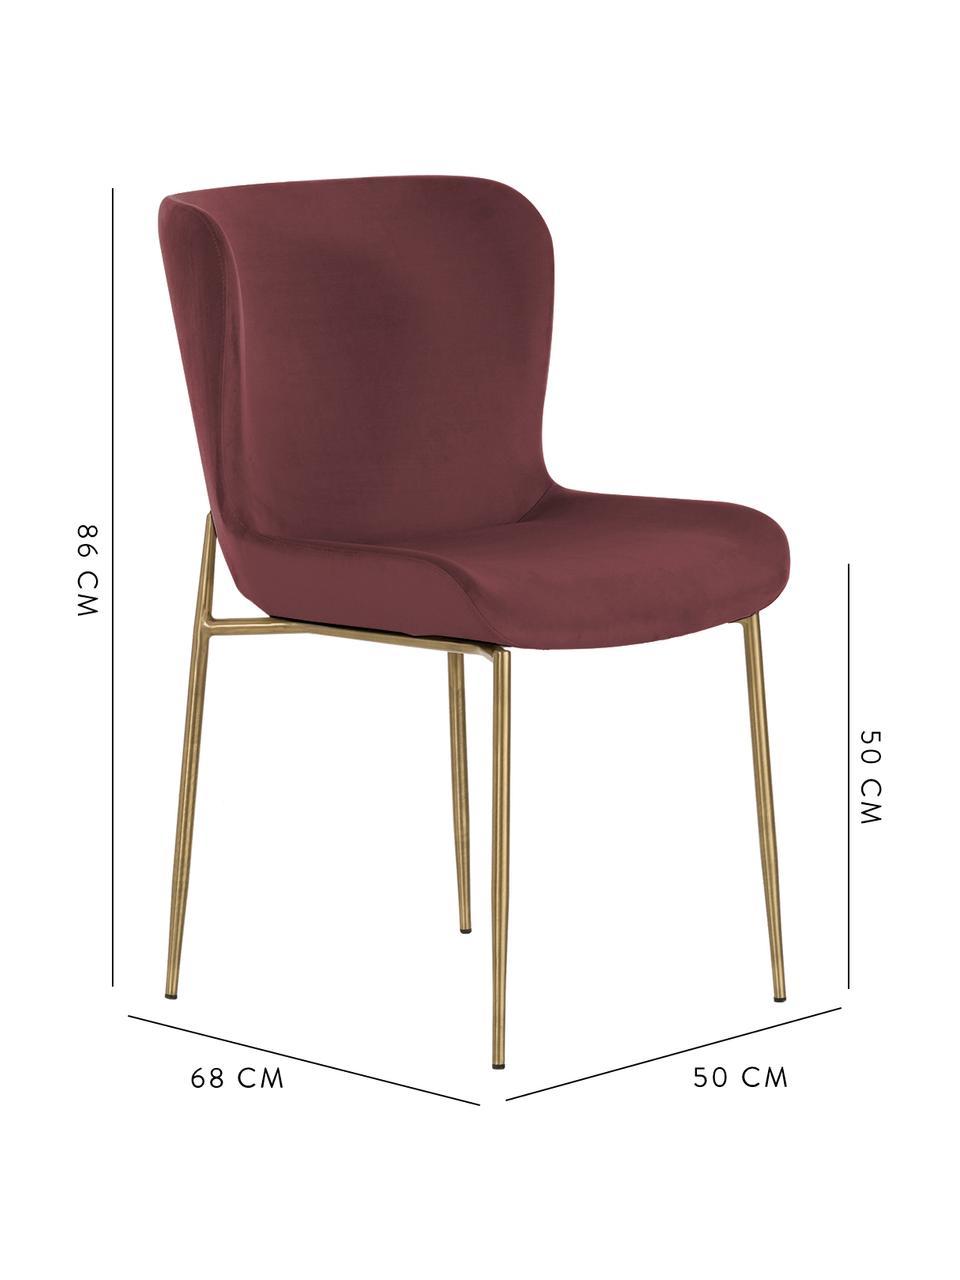 Samt-Polsterstuhl Tess, Bezug: Samt (Polyester) 30.000 S, Beine: Metall, beschichtet, Samt Bordeaux, Beine Gold, B 49 x T 64 cm